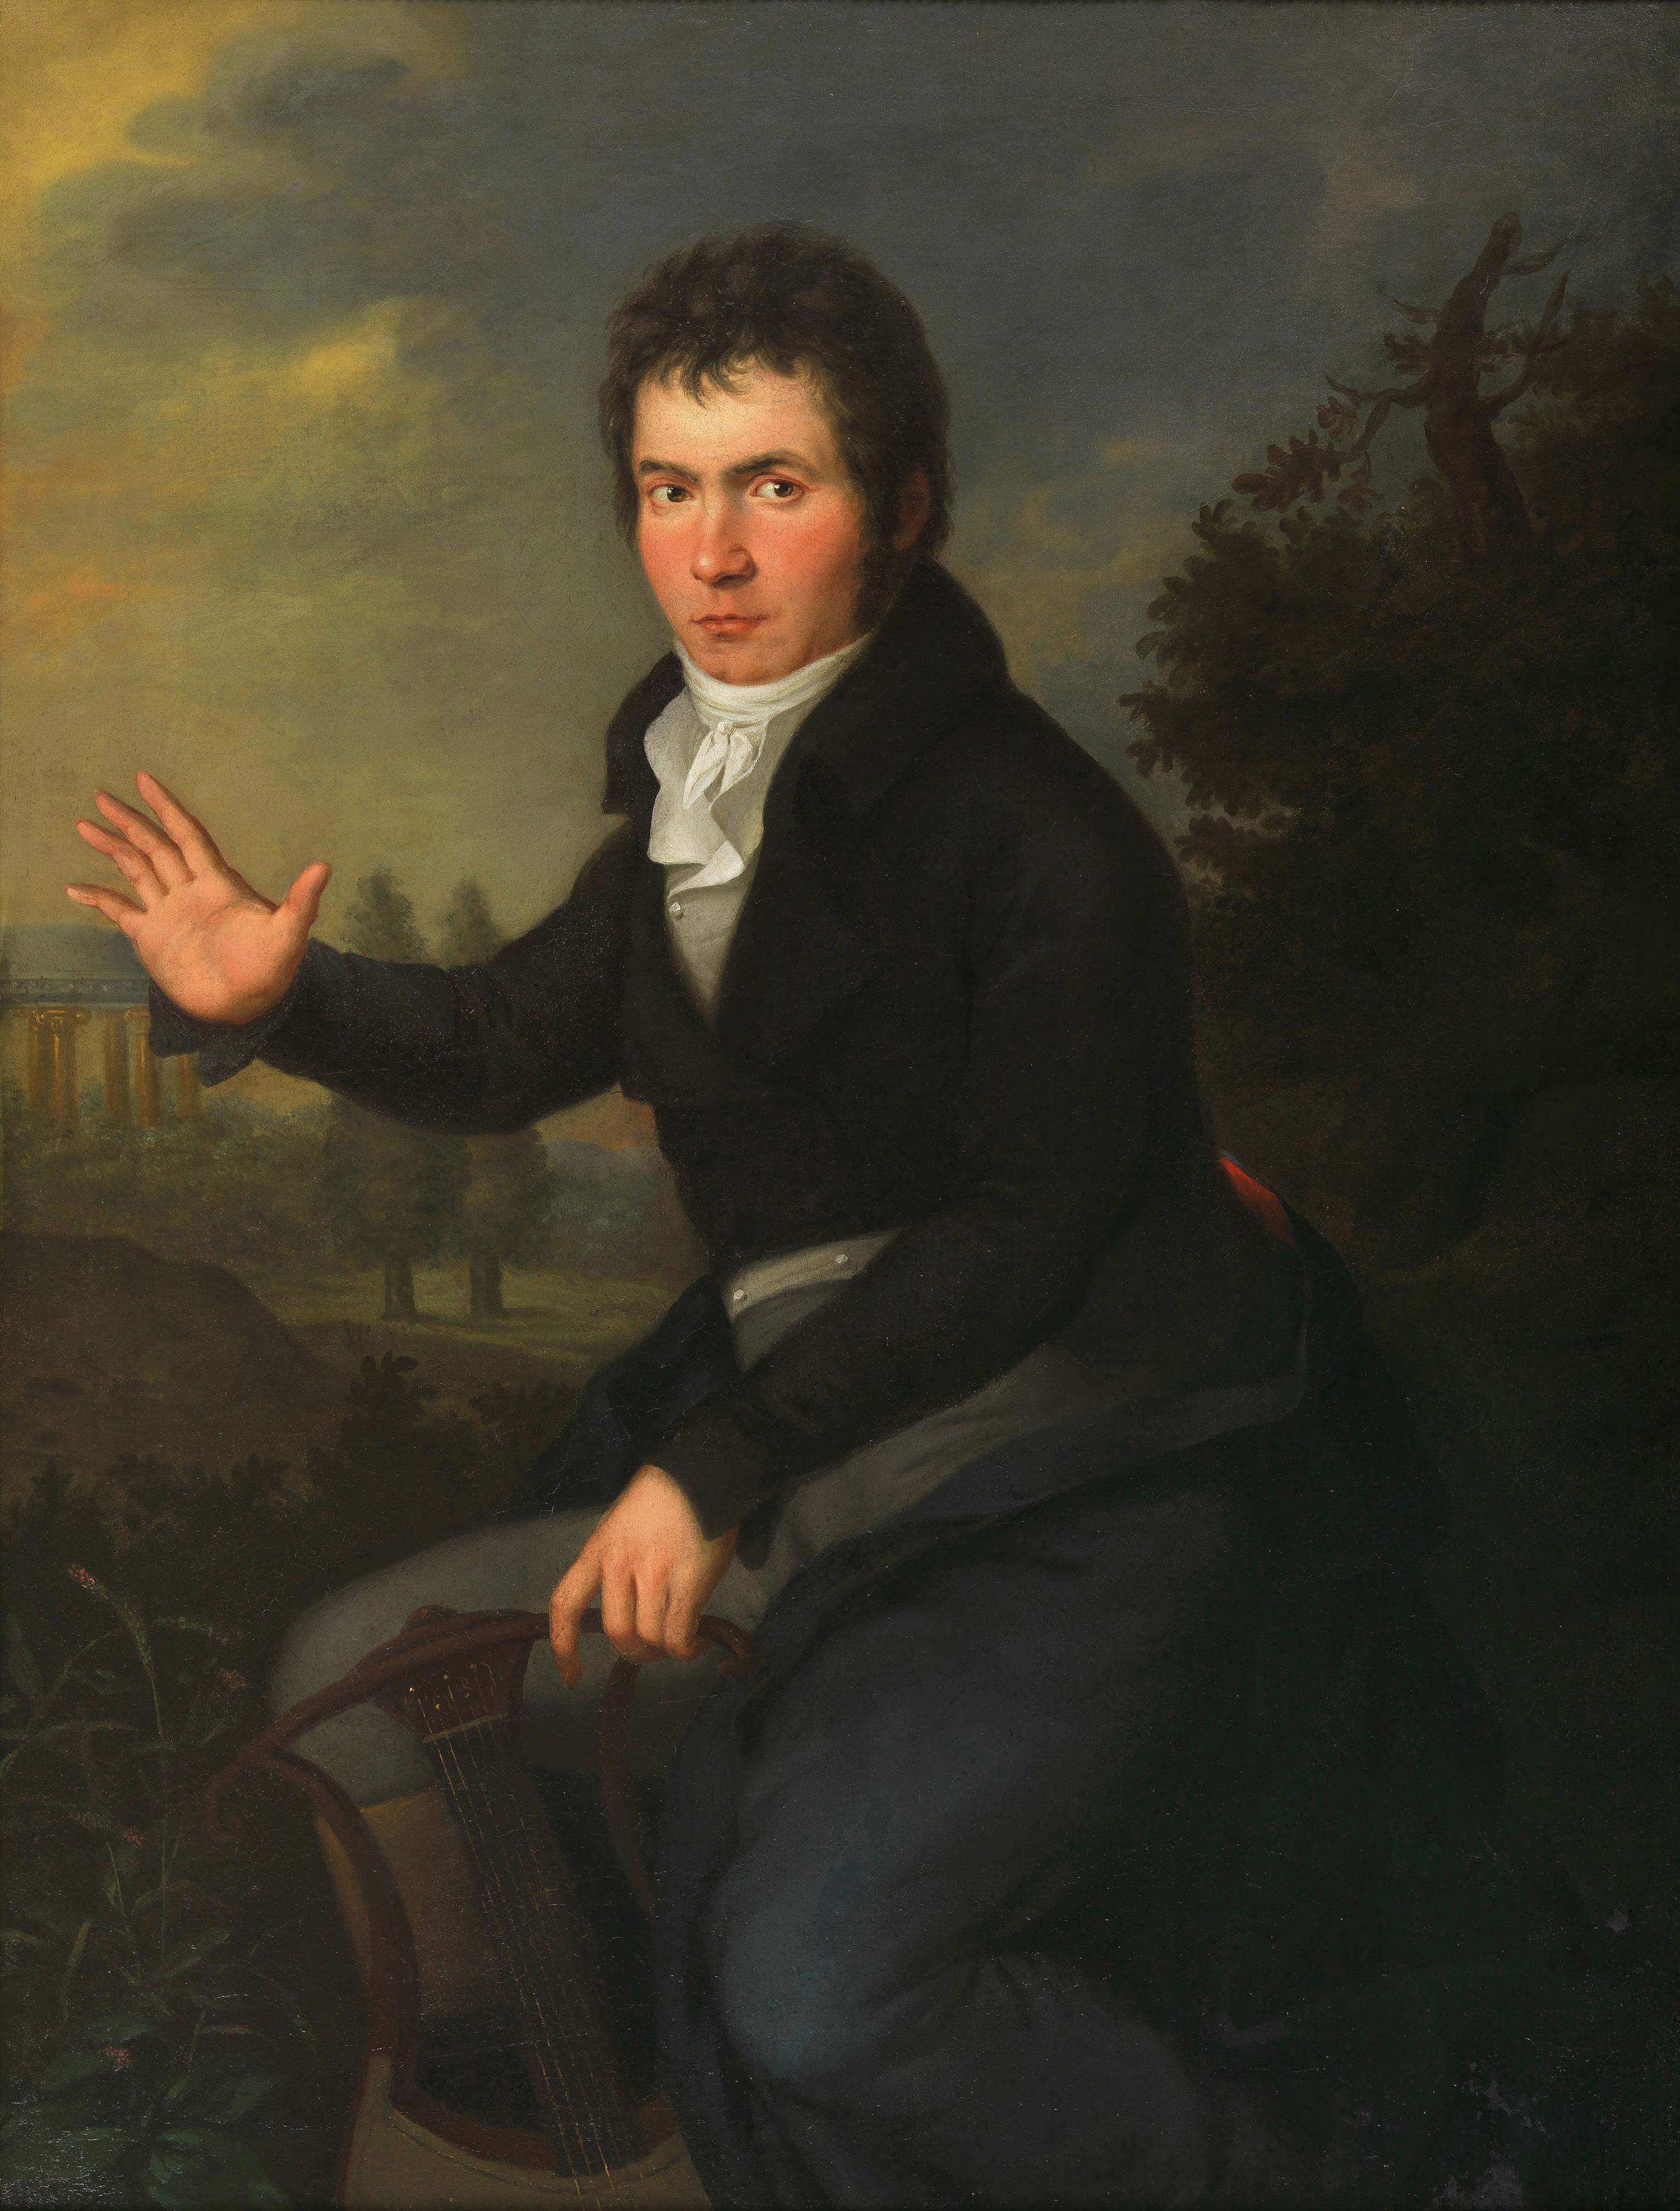 Ludwig van Beethoven, peinture de Josef Willibrord Mähler, entre 1804 et 1805. Wien Museum, photo de Birgit et Peter Kainz CC BY 3.0